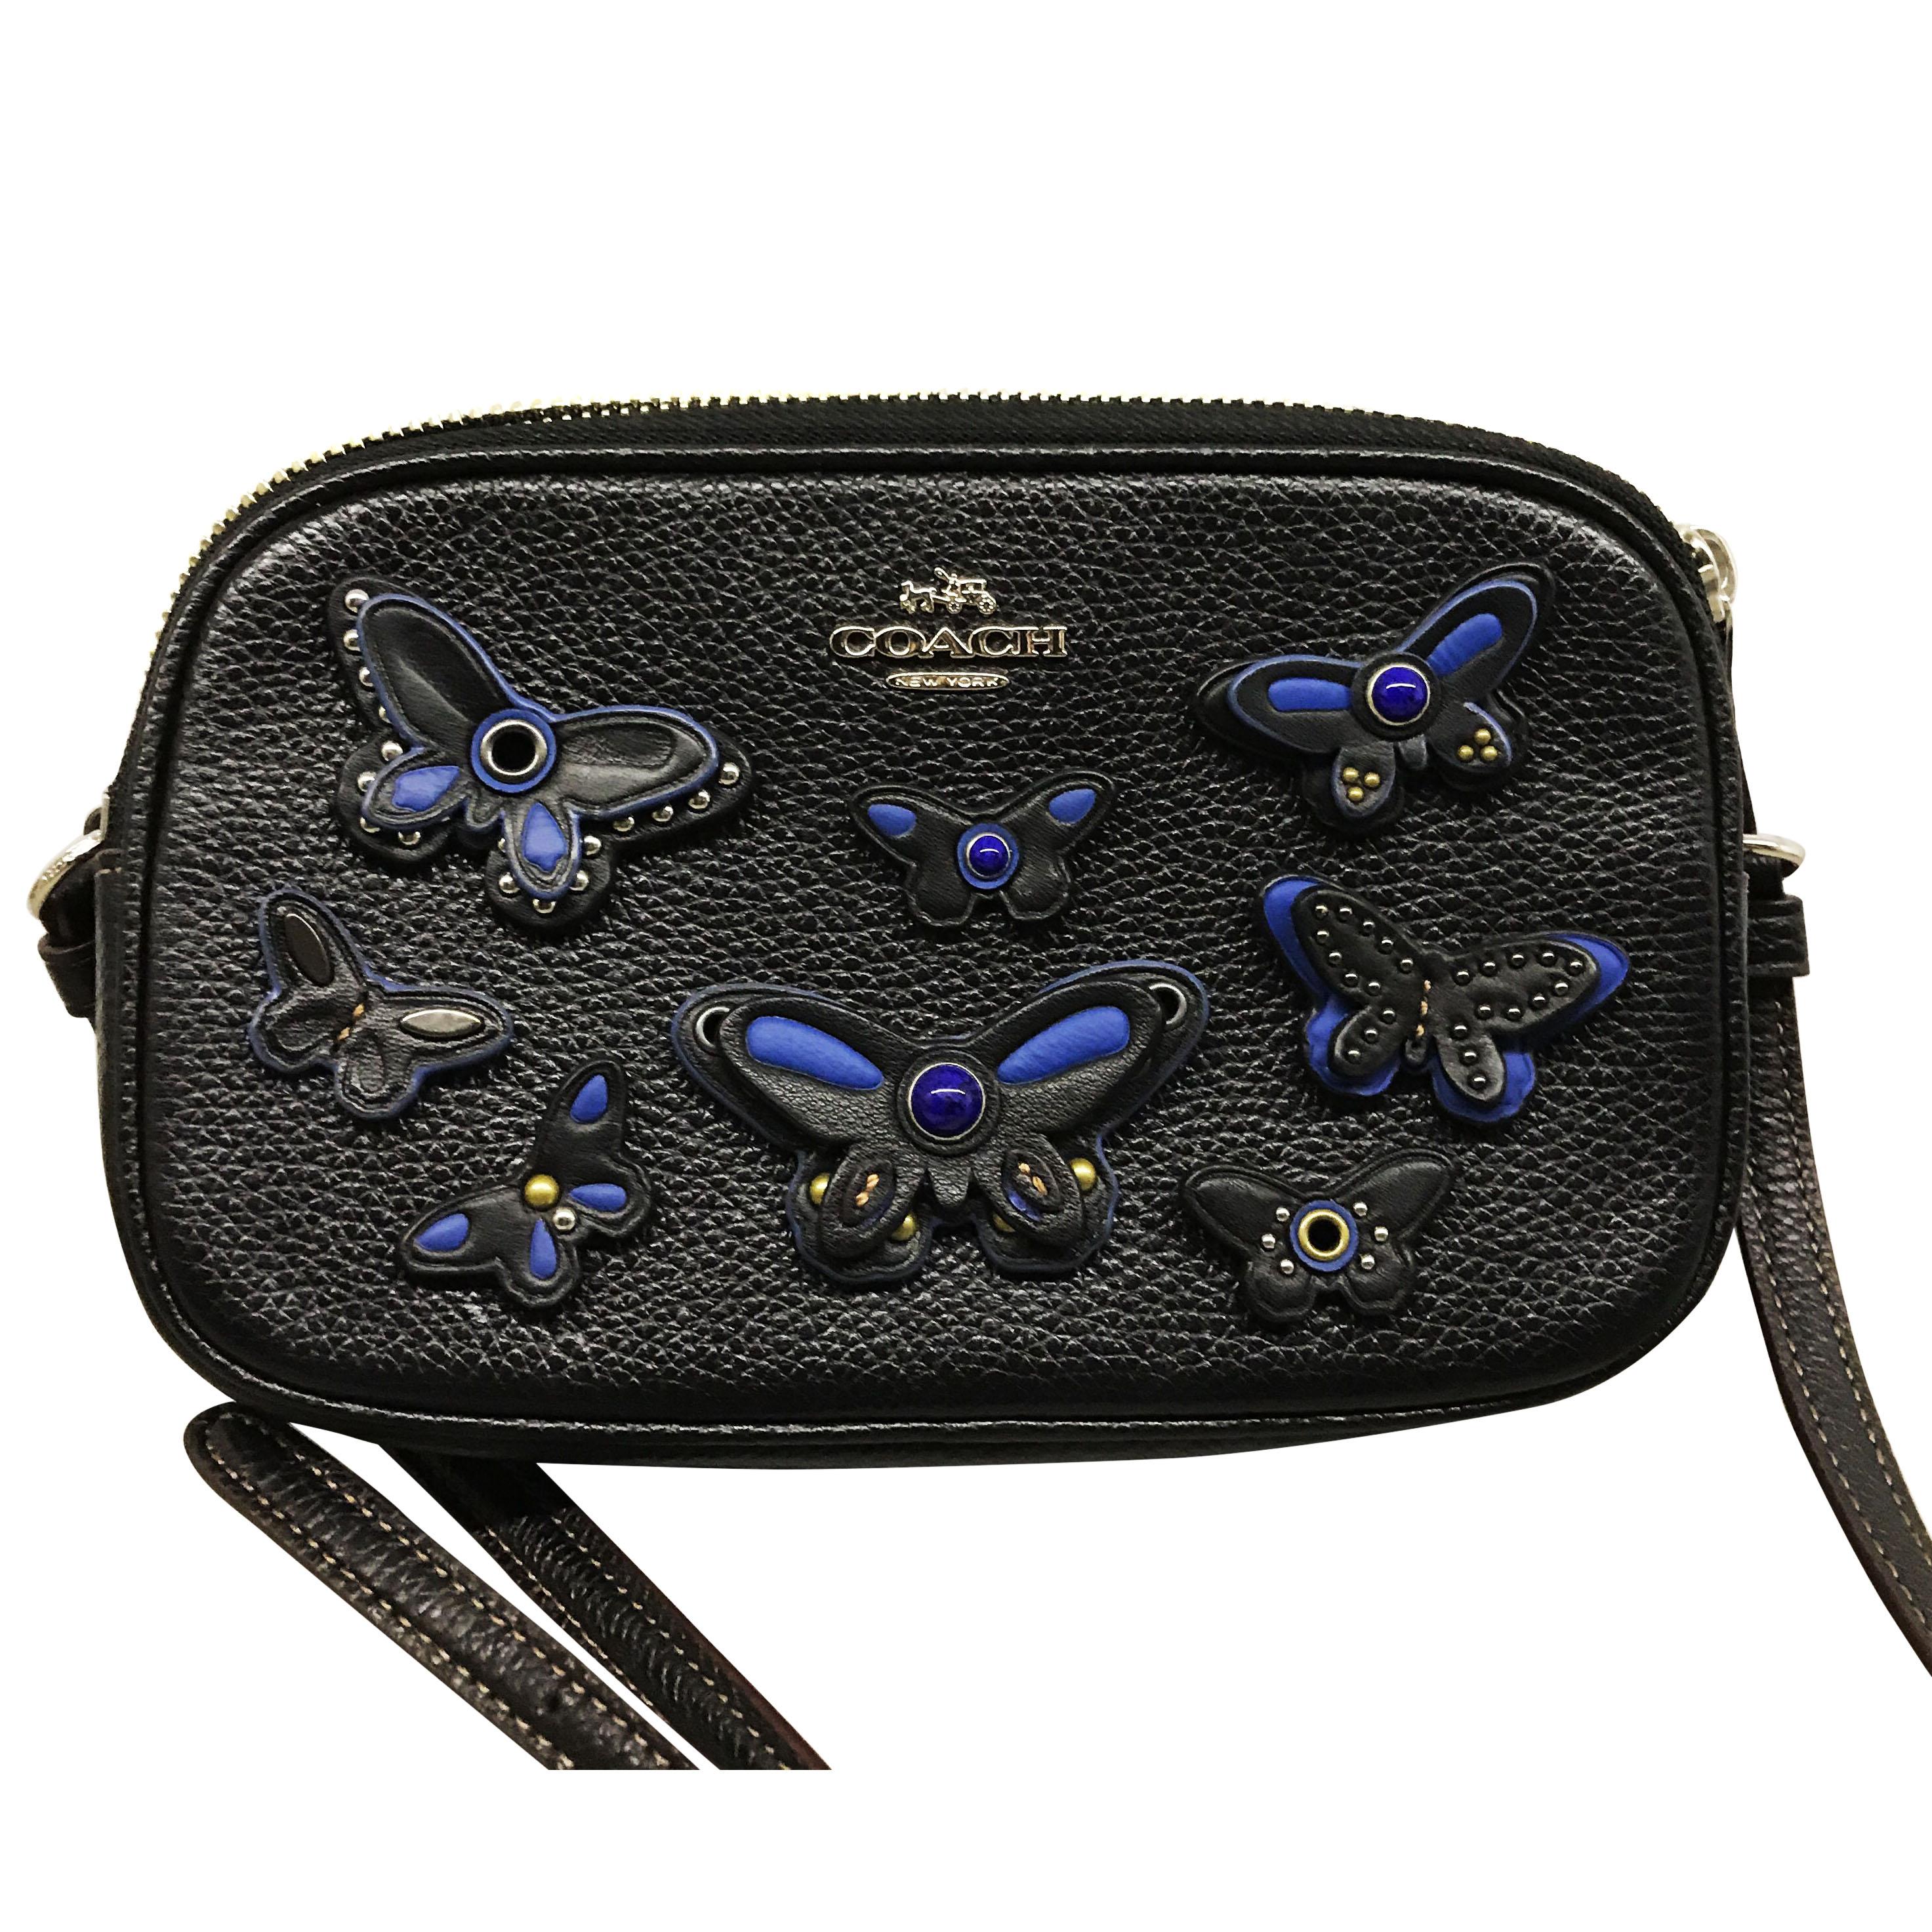 Coach black cross body bag with blue butterflies